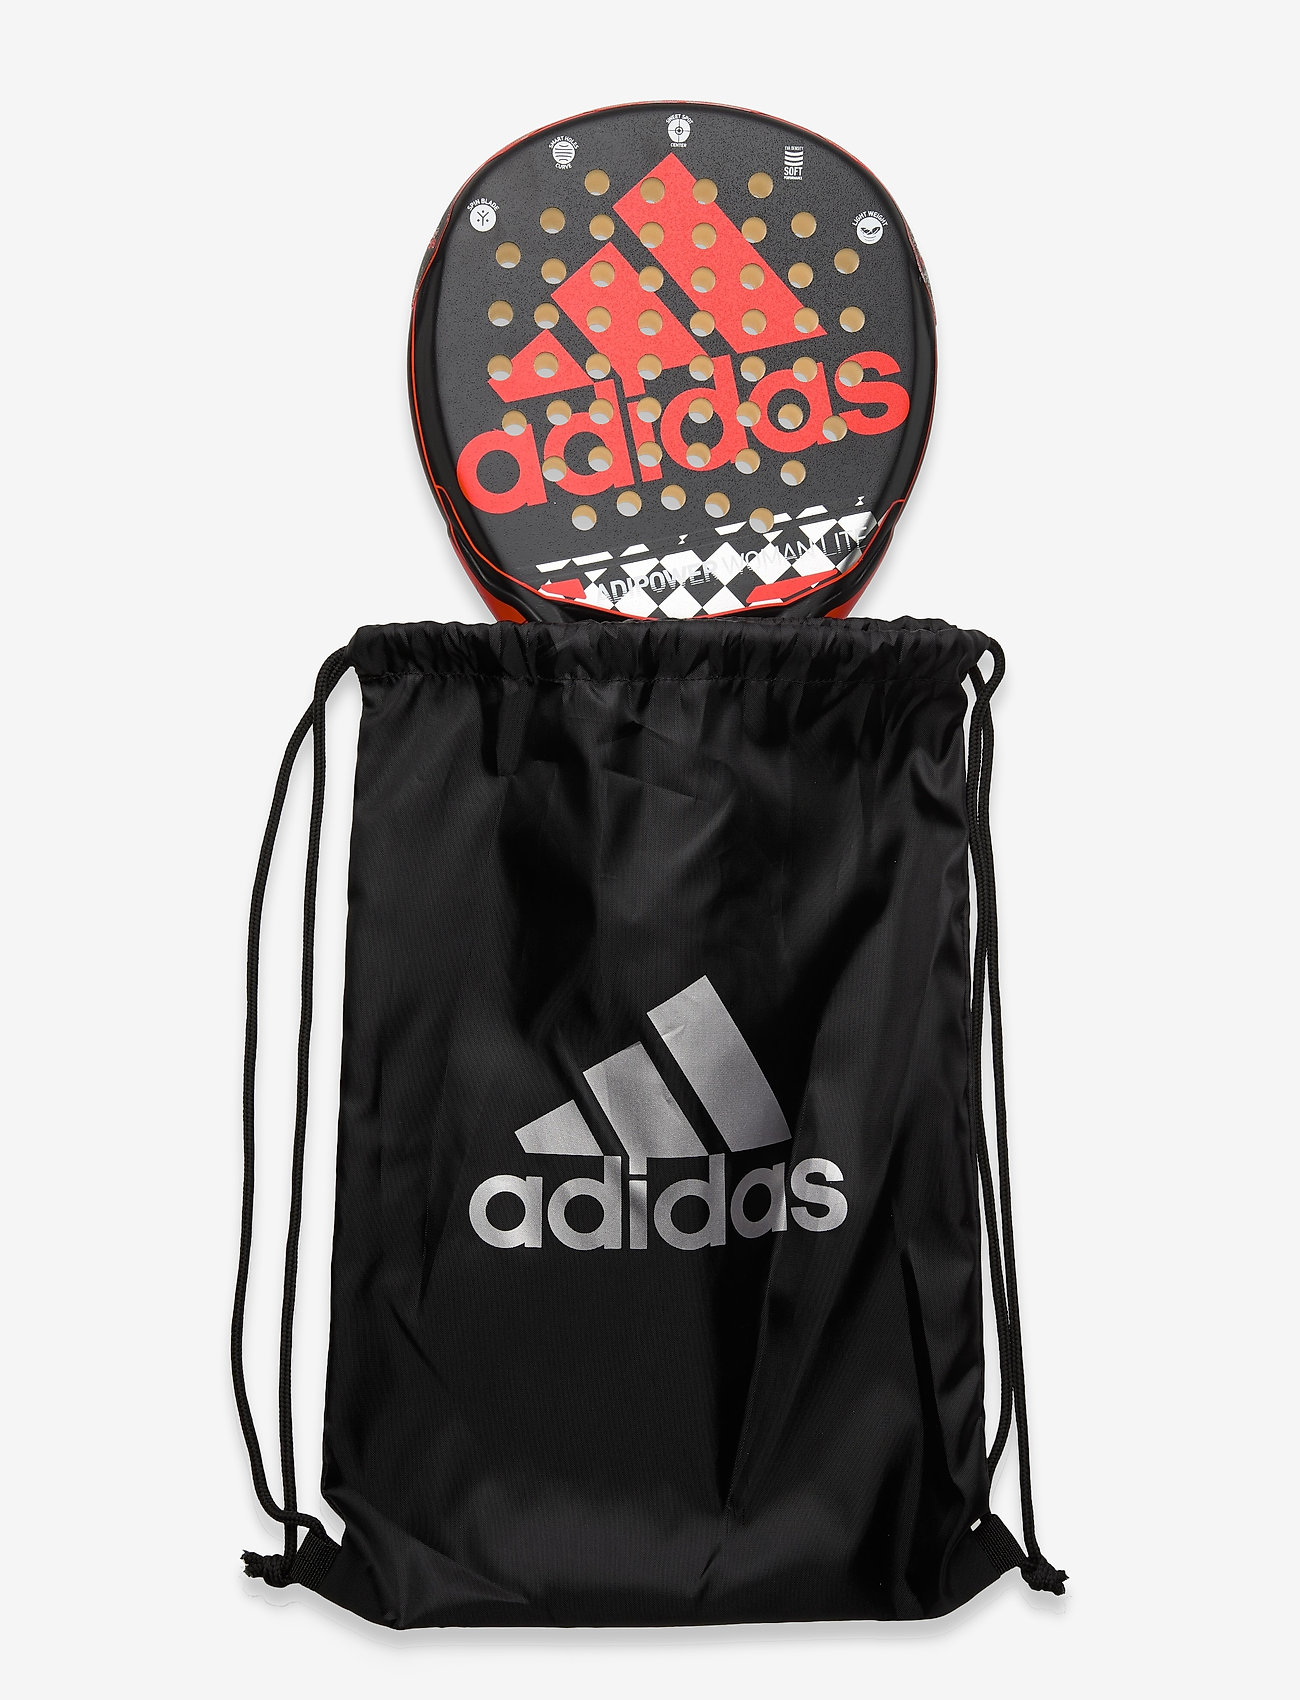 adidas Performance - adipower Woman Lite - padel rackets - pink - 1